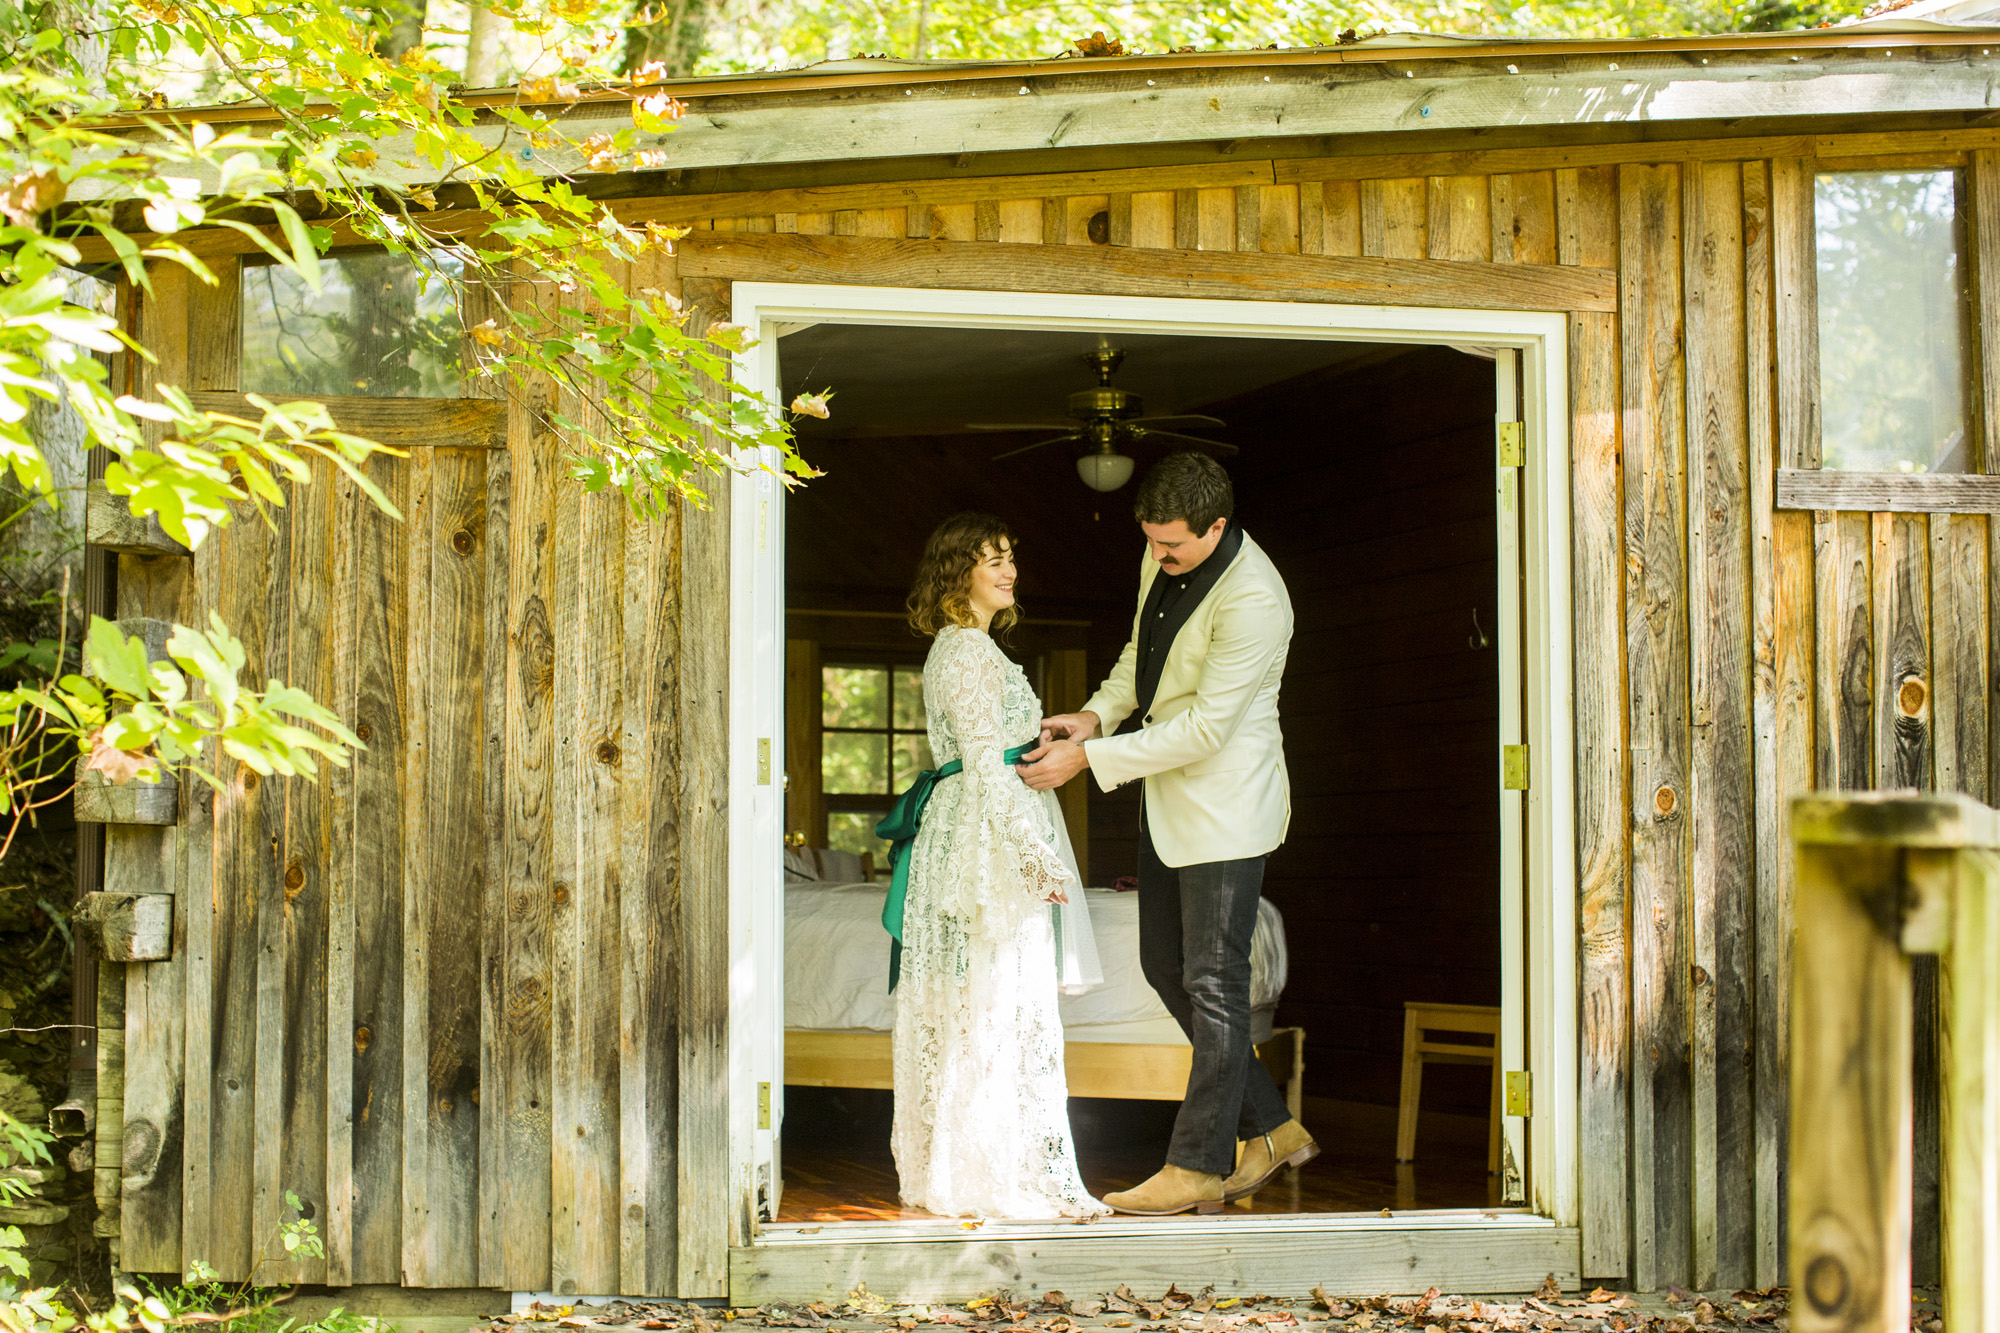 Seriously_Sabrina_Photography_Red_River_Gorge_Kentucky_Wedding_ShawnDana48.jpg